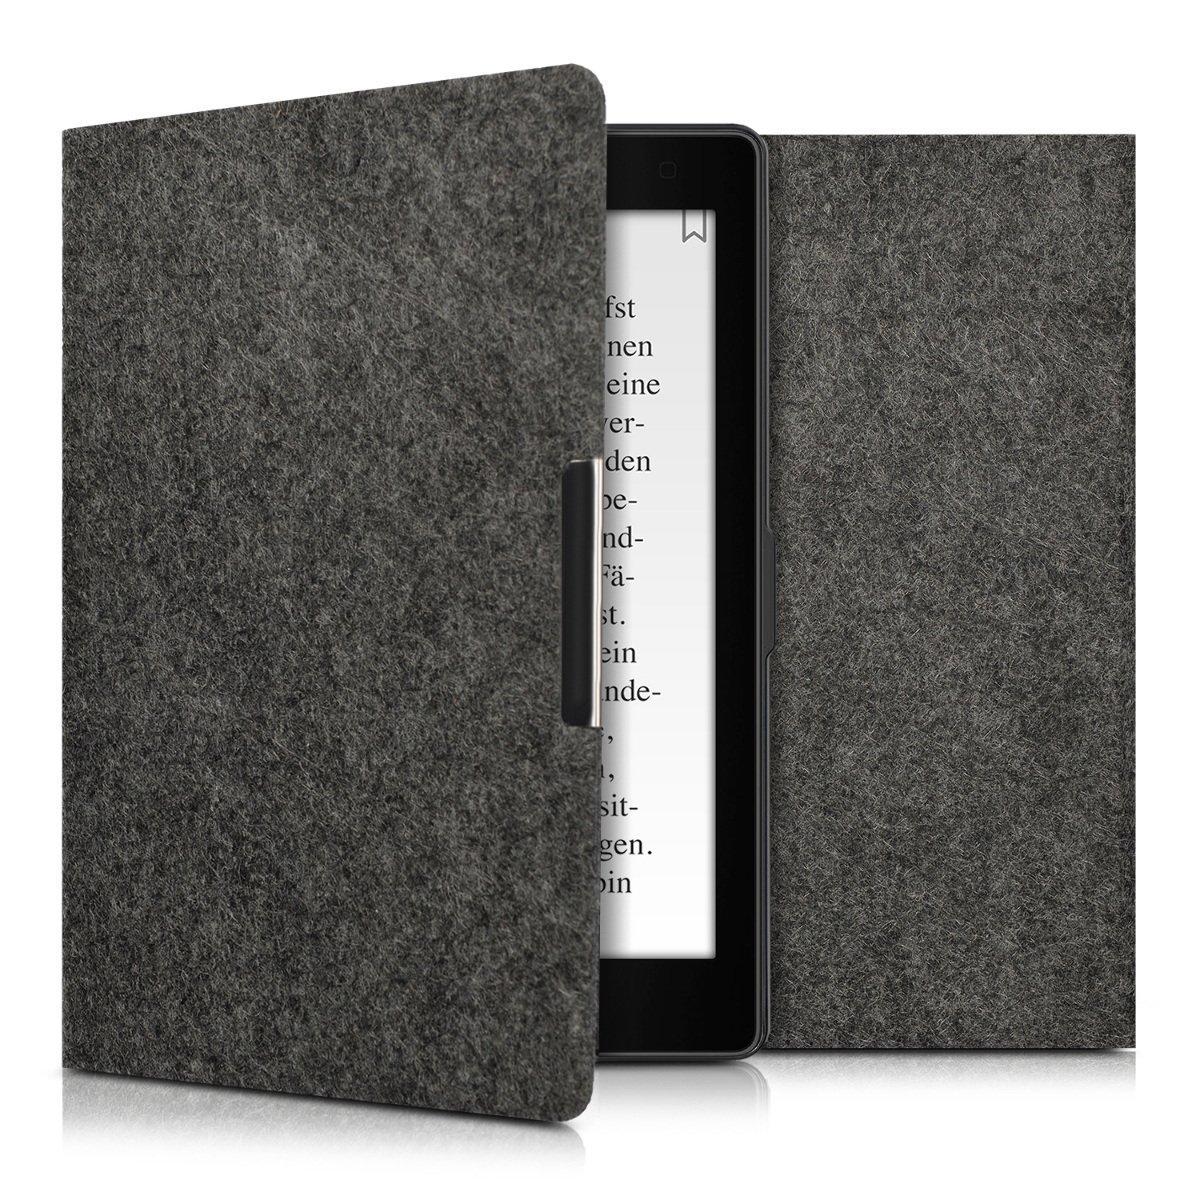 kwmobile Case for Kobo Aura ONE - Book Style Felt Fabric Protective e-Reader Cover Folio Case - dark grey